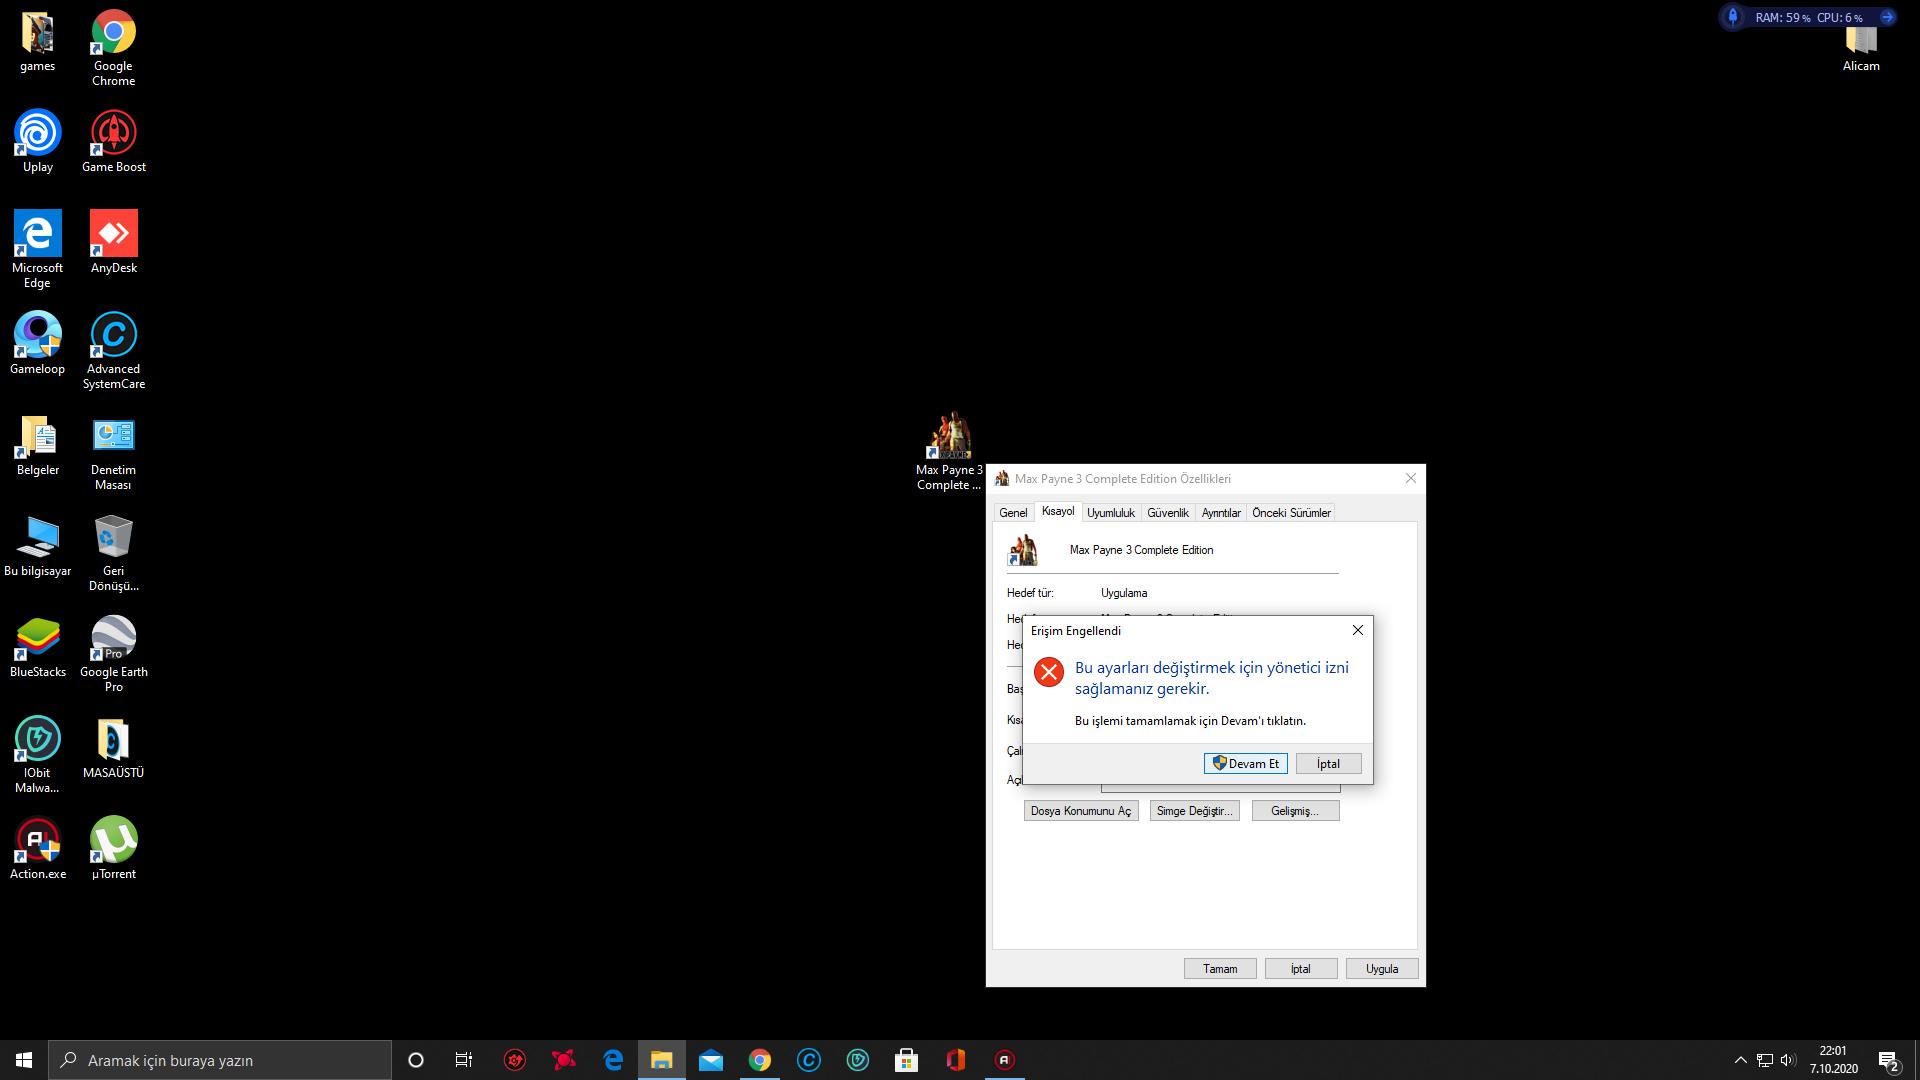 Desktop 7-10-2020 22-01-02-451.png